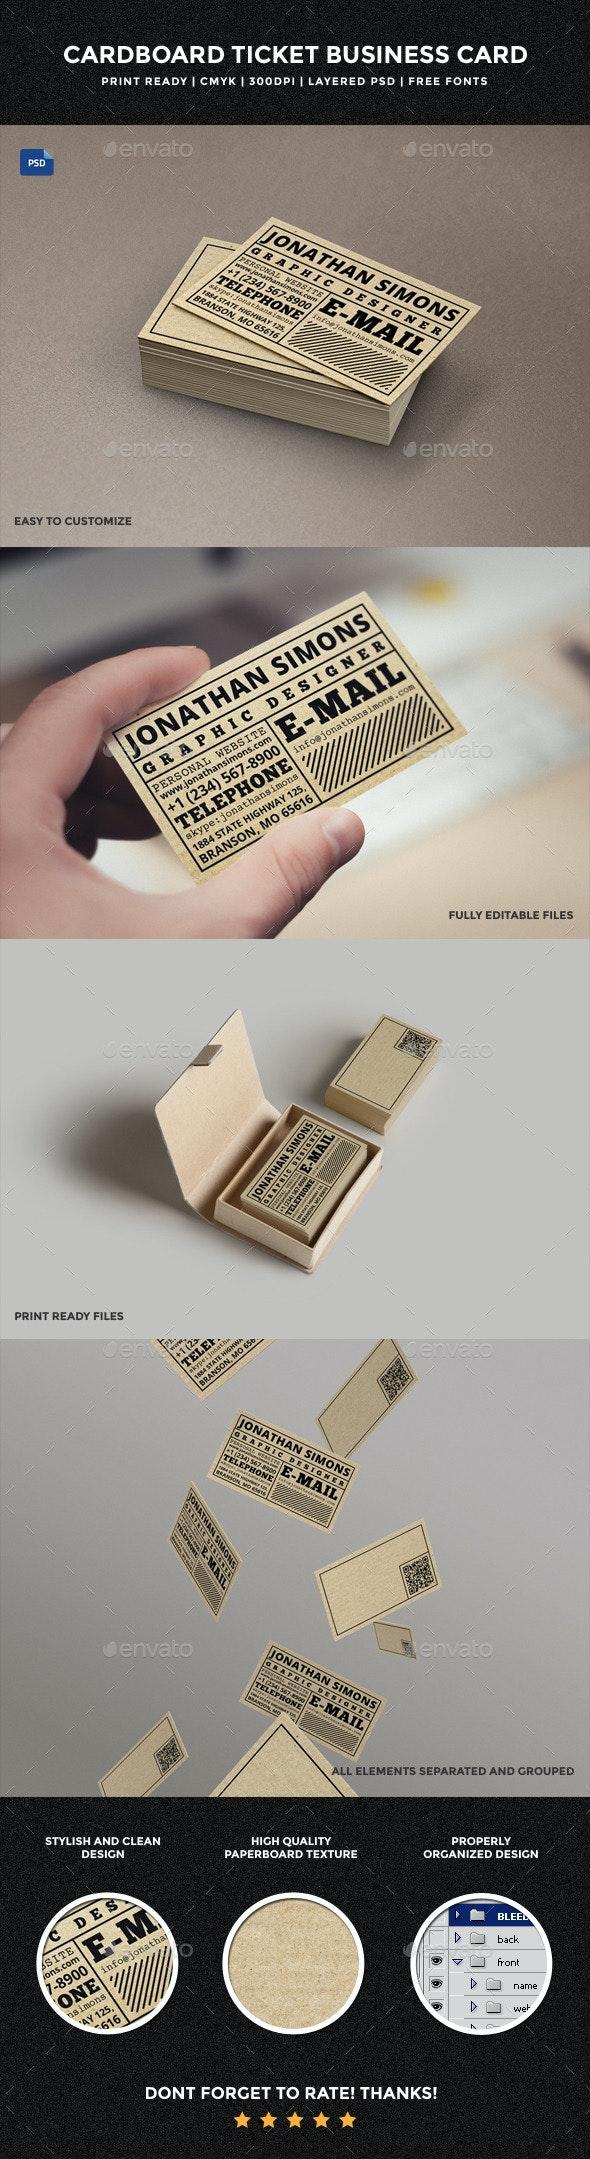 Cardboard Ticket Business Card - 30 - Creative Business Cards